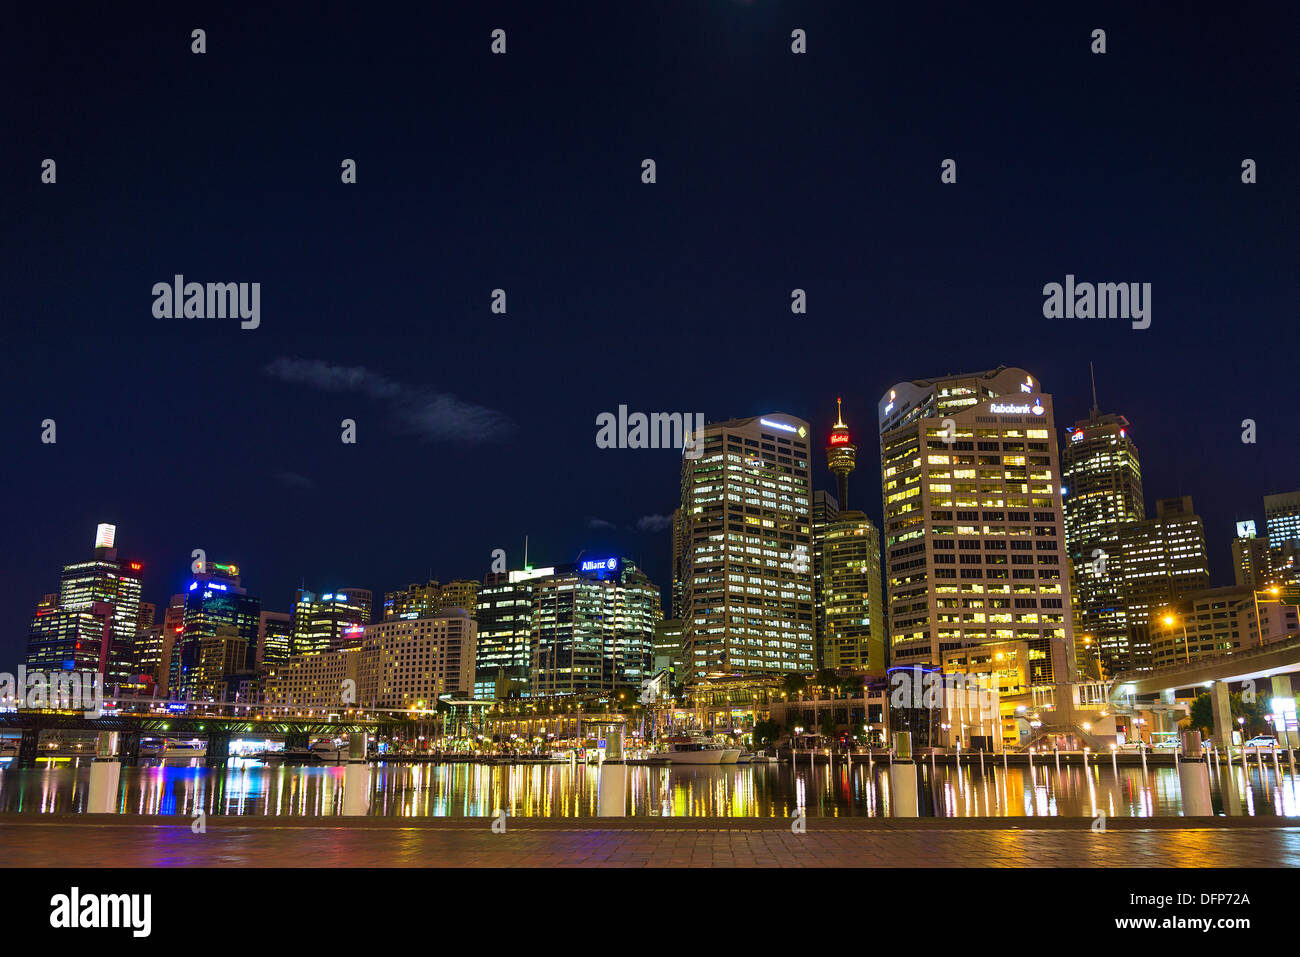 darling harbour skyline in sydney australia - Stock Image